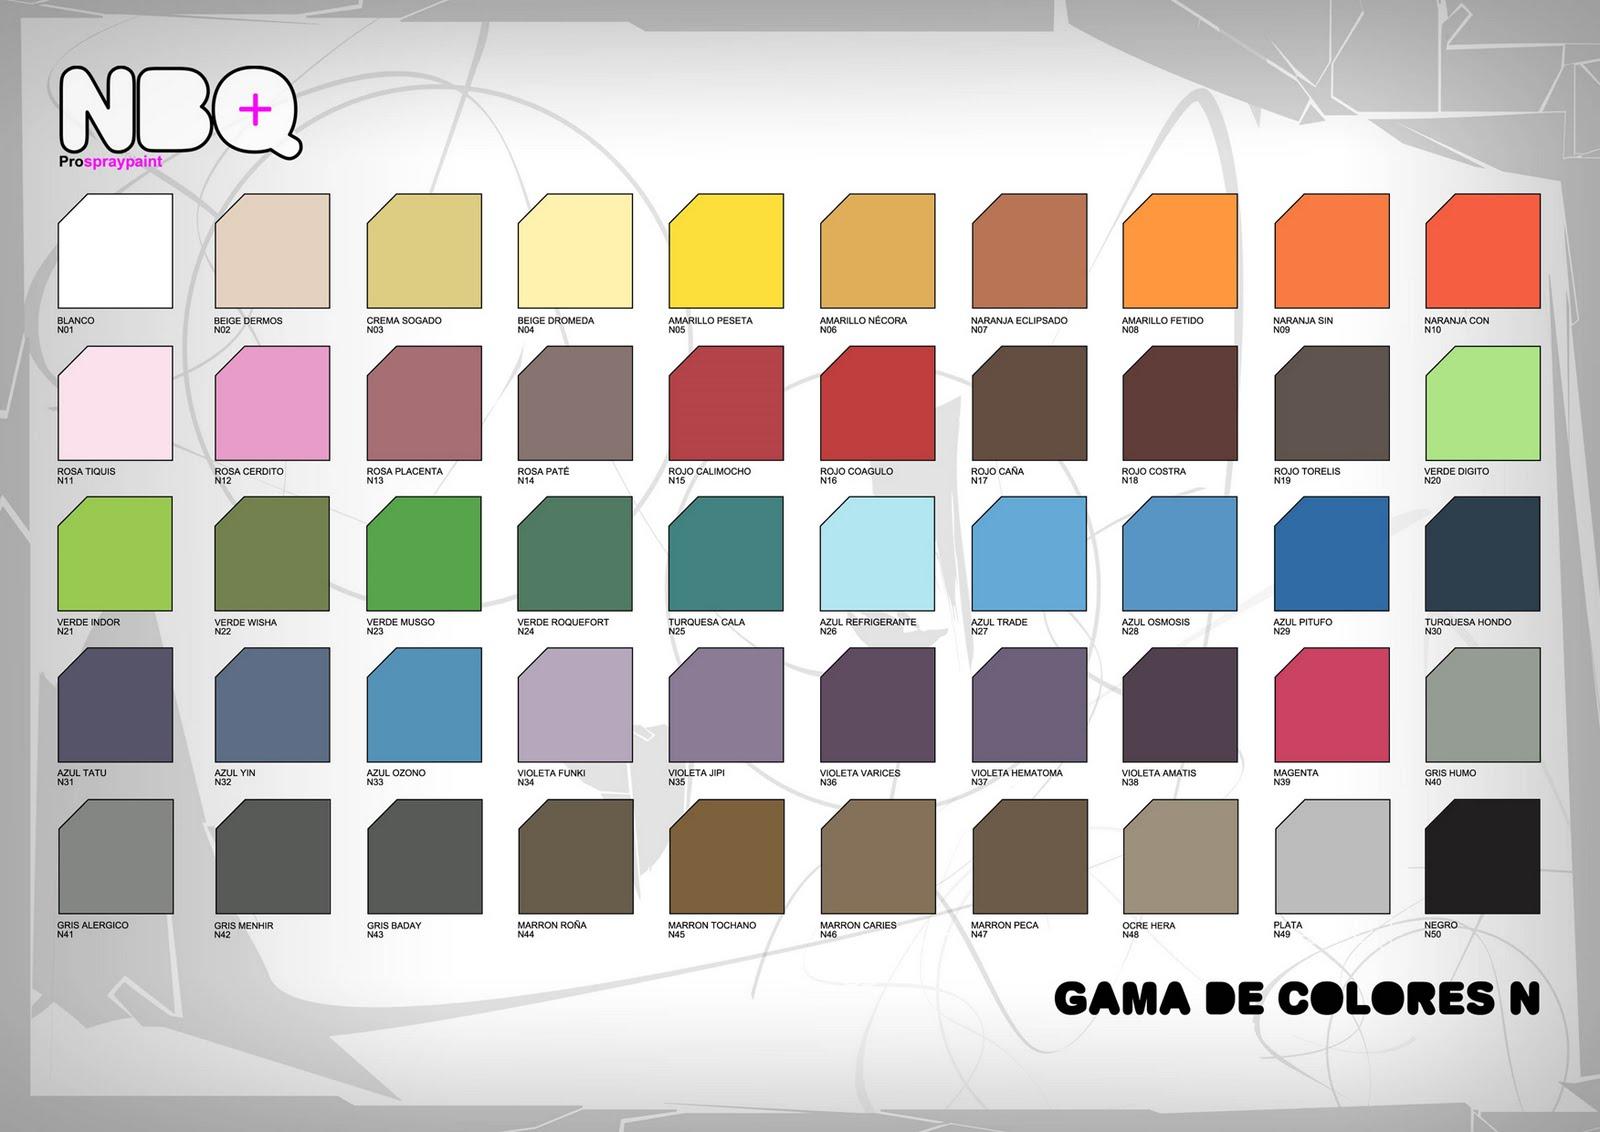 Pin pinturas montana carta de colores hawaii dermatology - Gama colores pintura ...